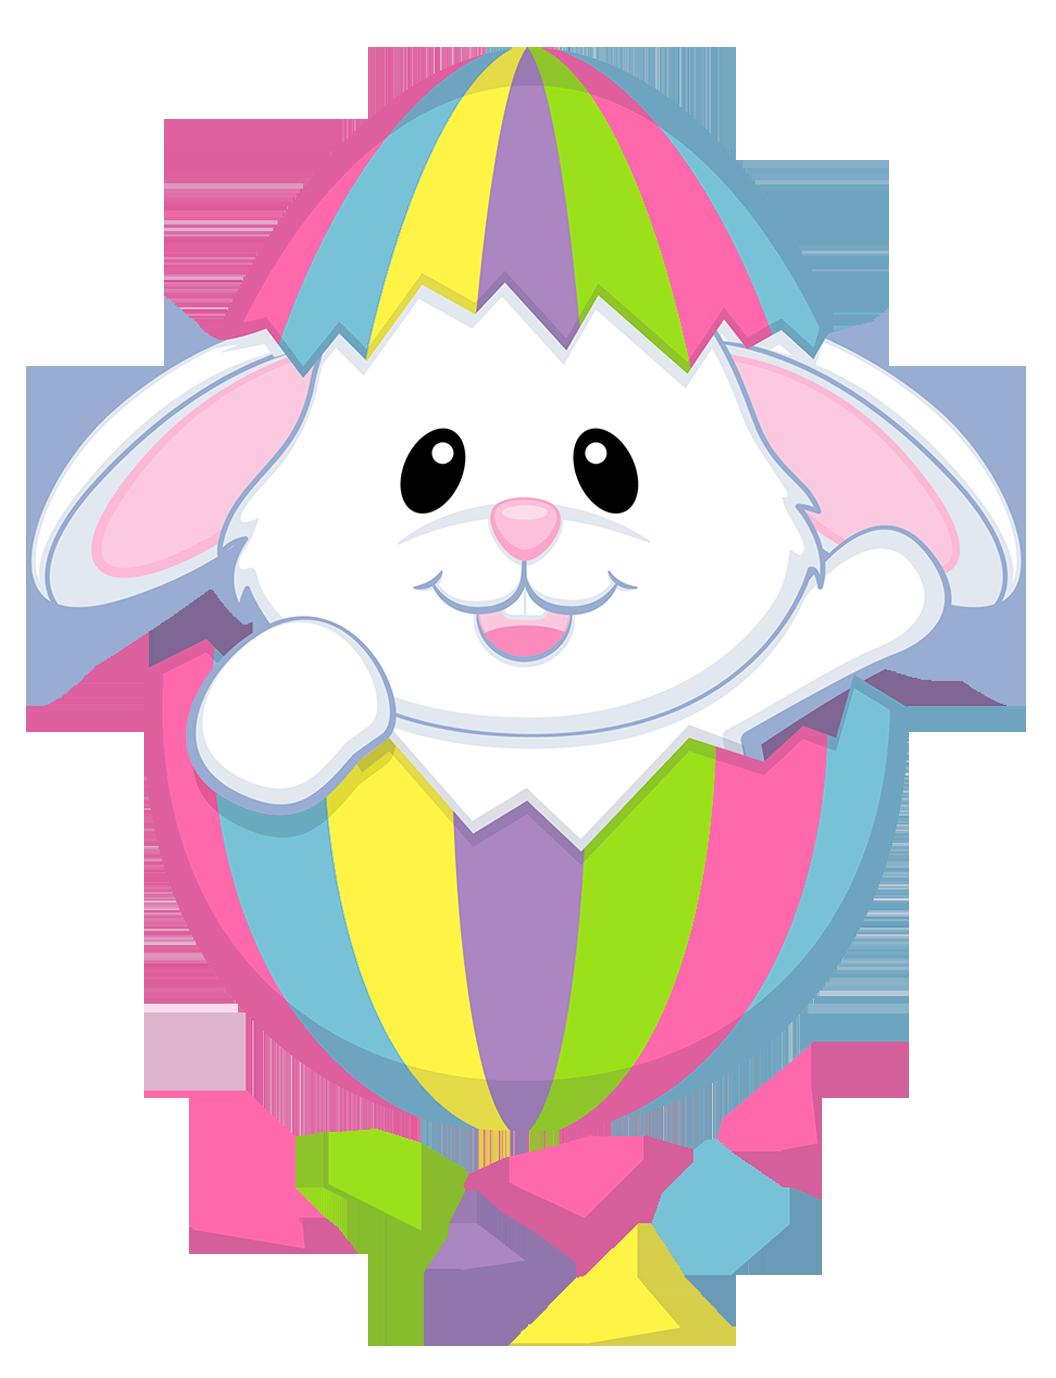 Easter Bunny Easter Bunny Pictures Easter Bunny Images Easter Images Clip Art